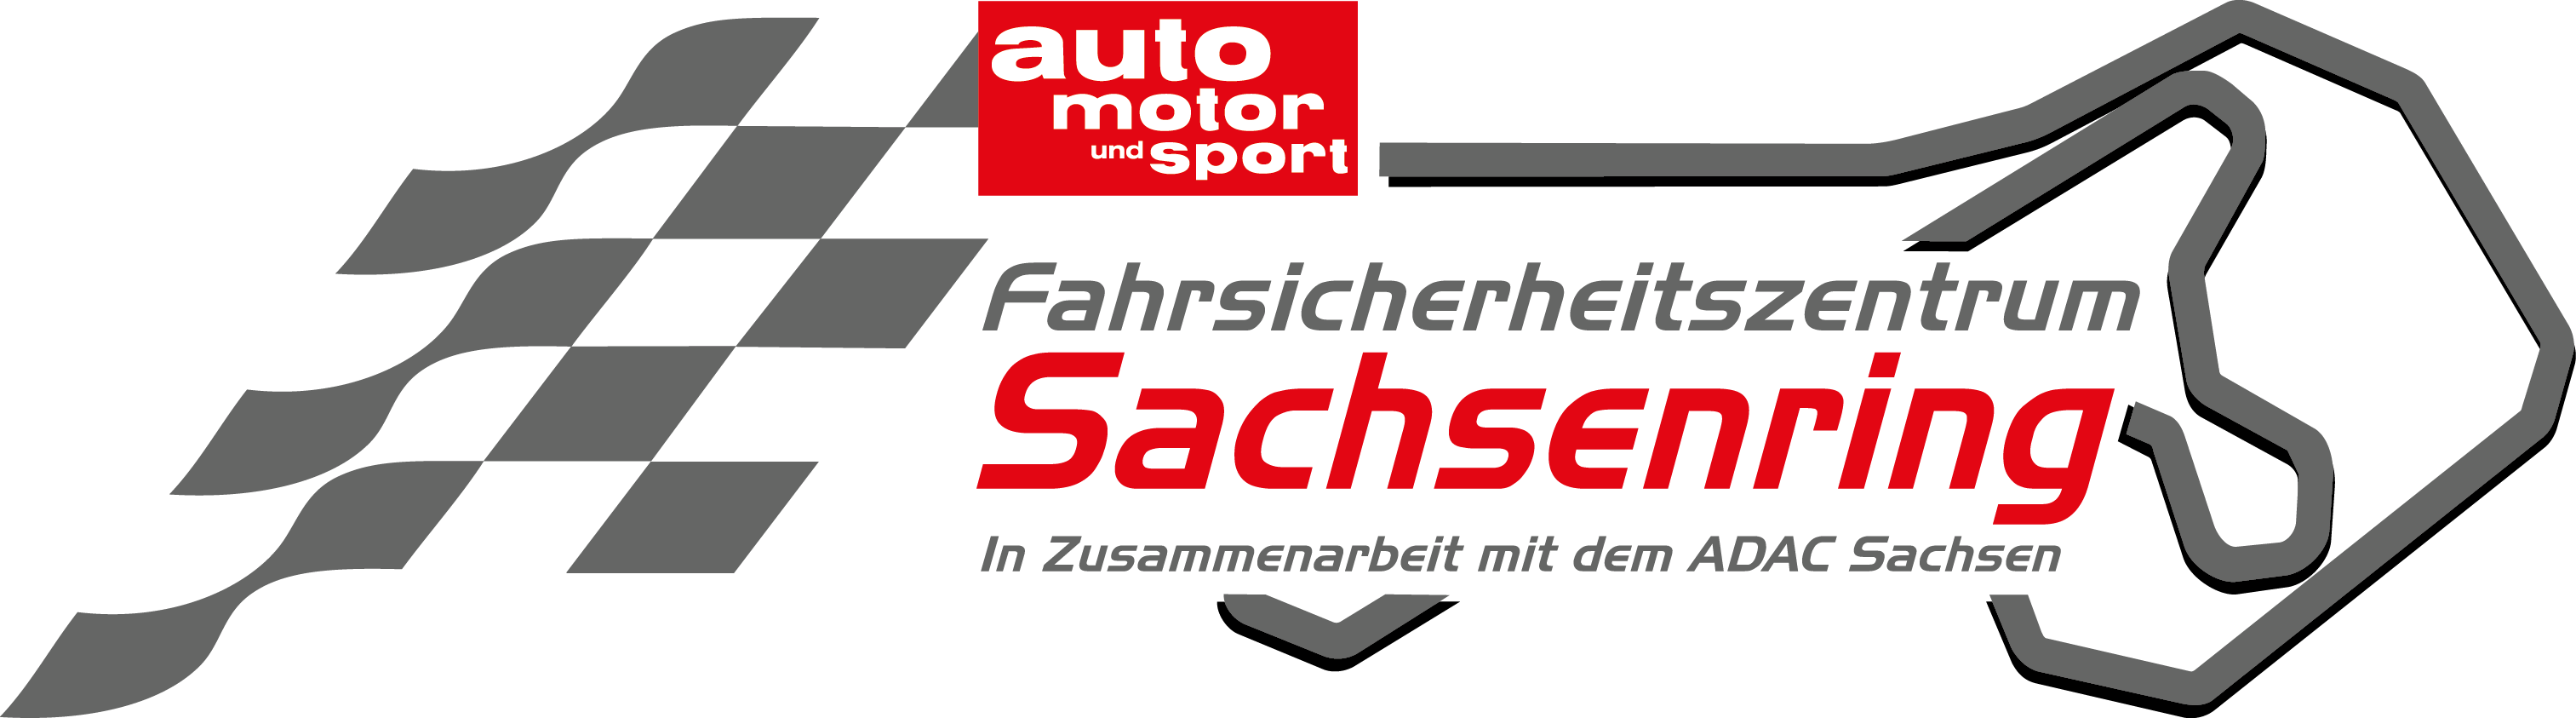 ADAC Sachsenring Classic 07.05. – 09.05.2021